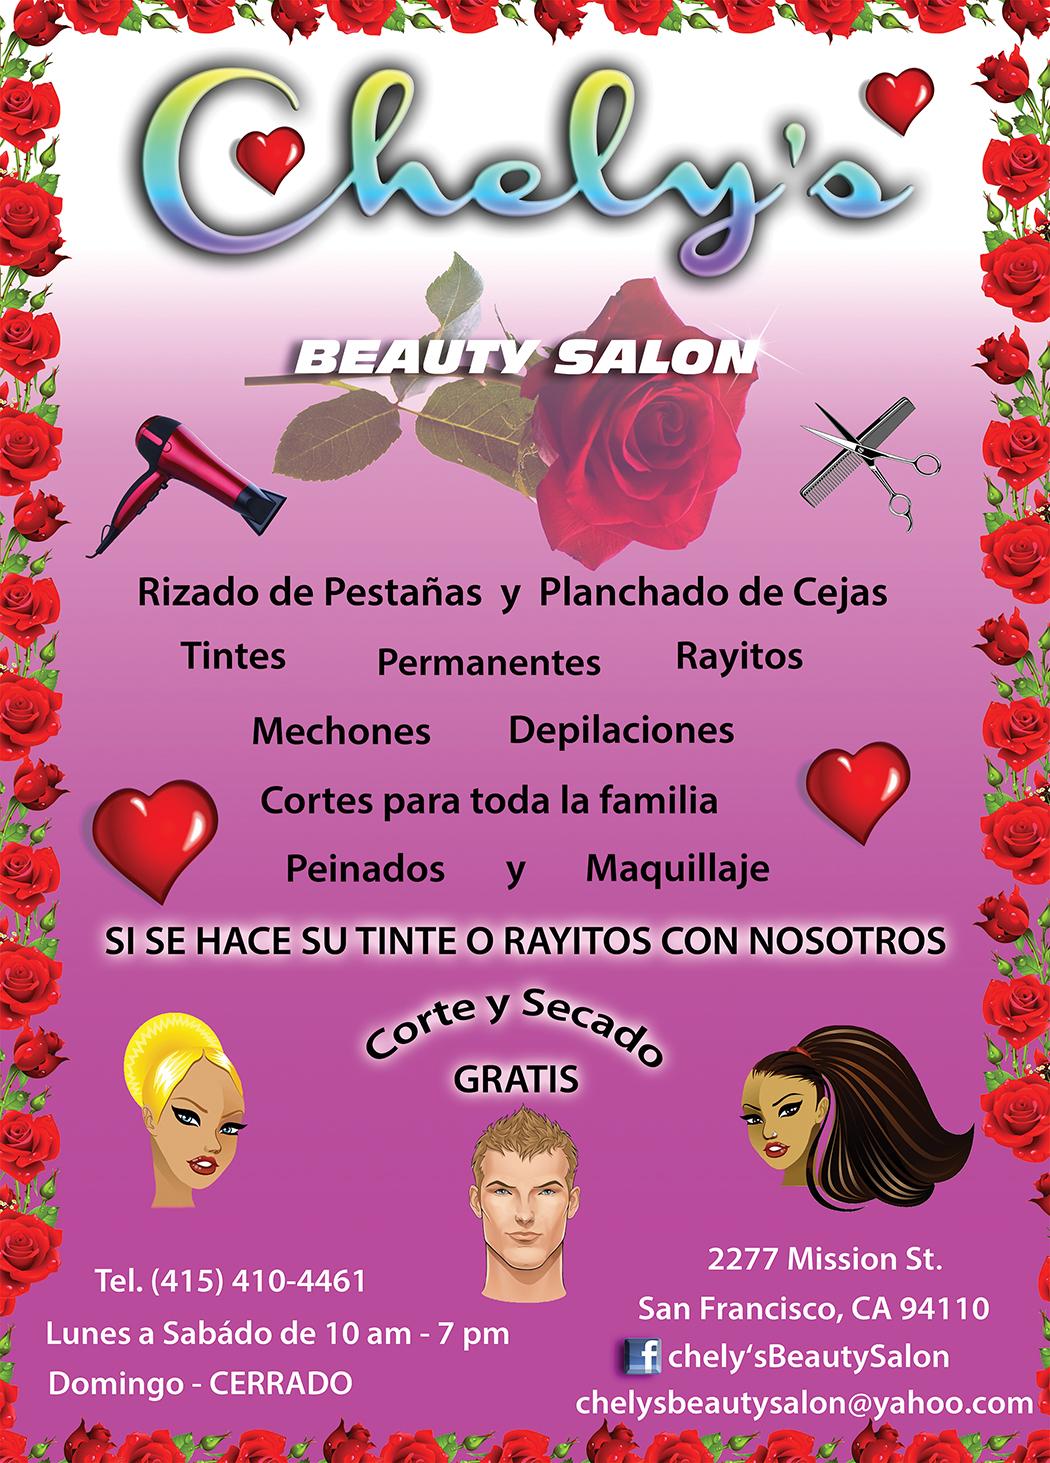 Chelys Beauty Salon 1 Pag glossy -  feb 2019.jpg